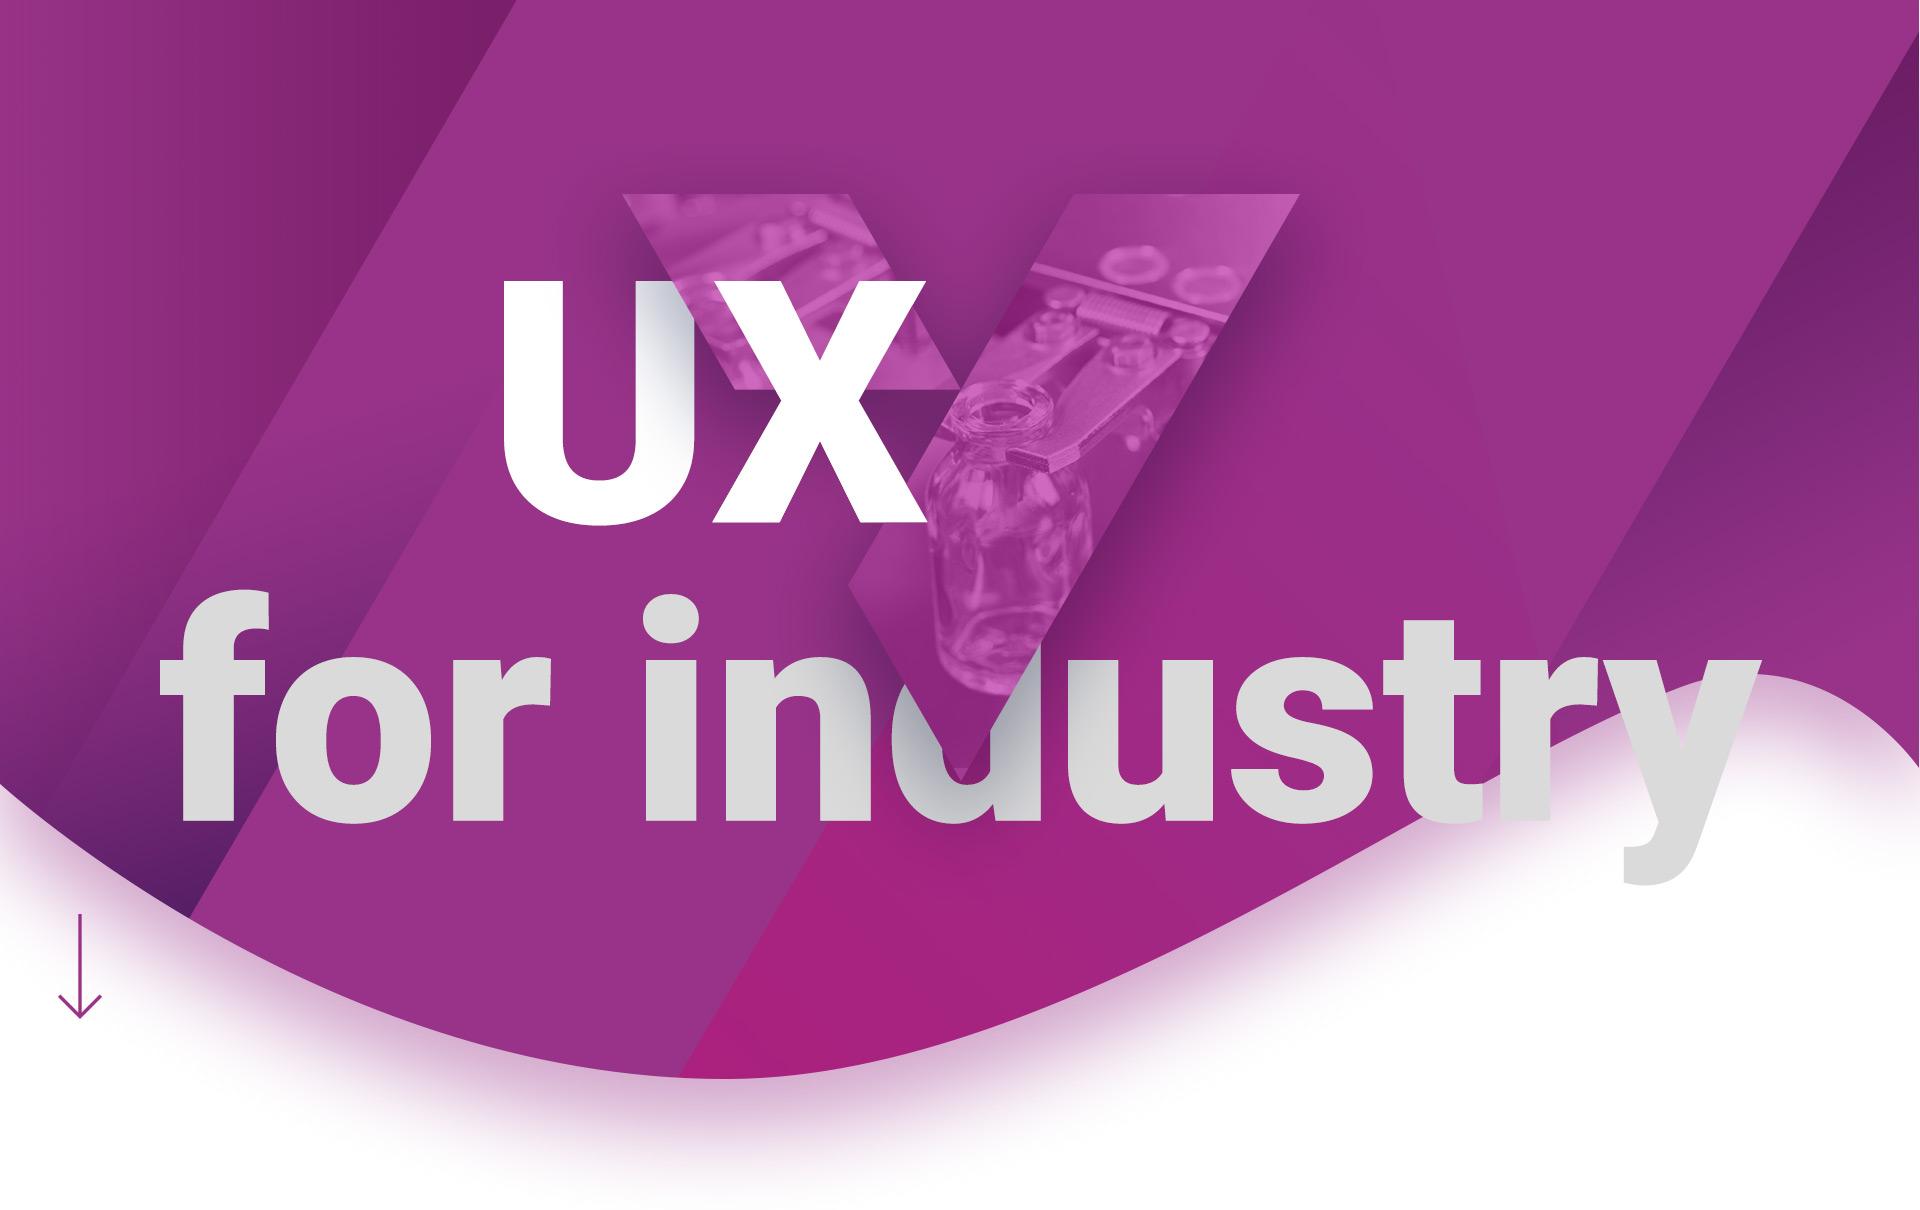 V-INTAL - UX for industry